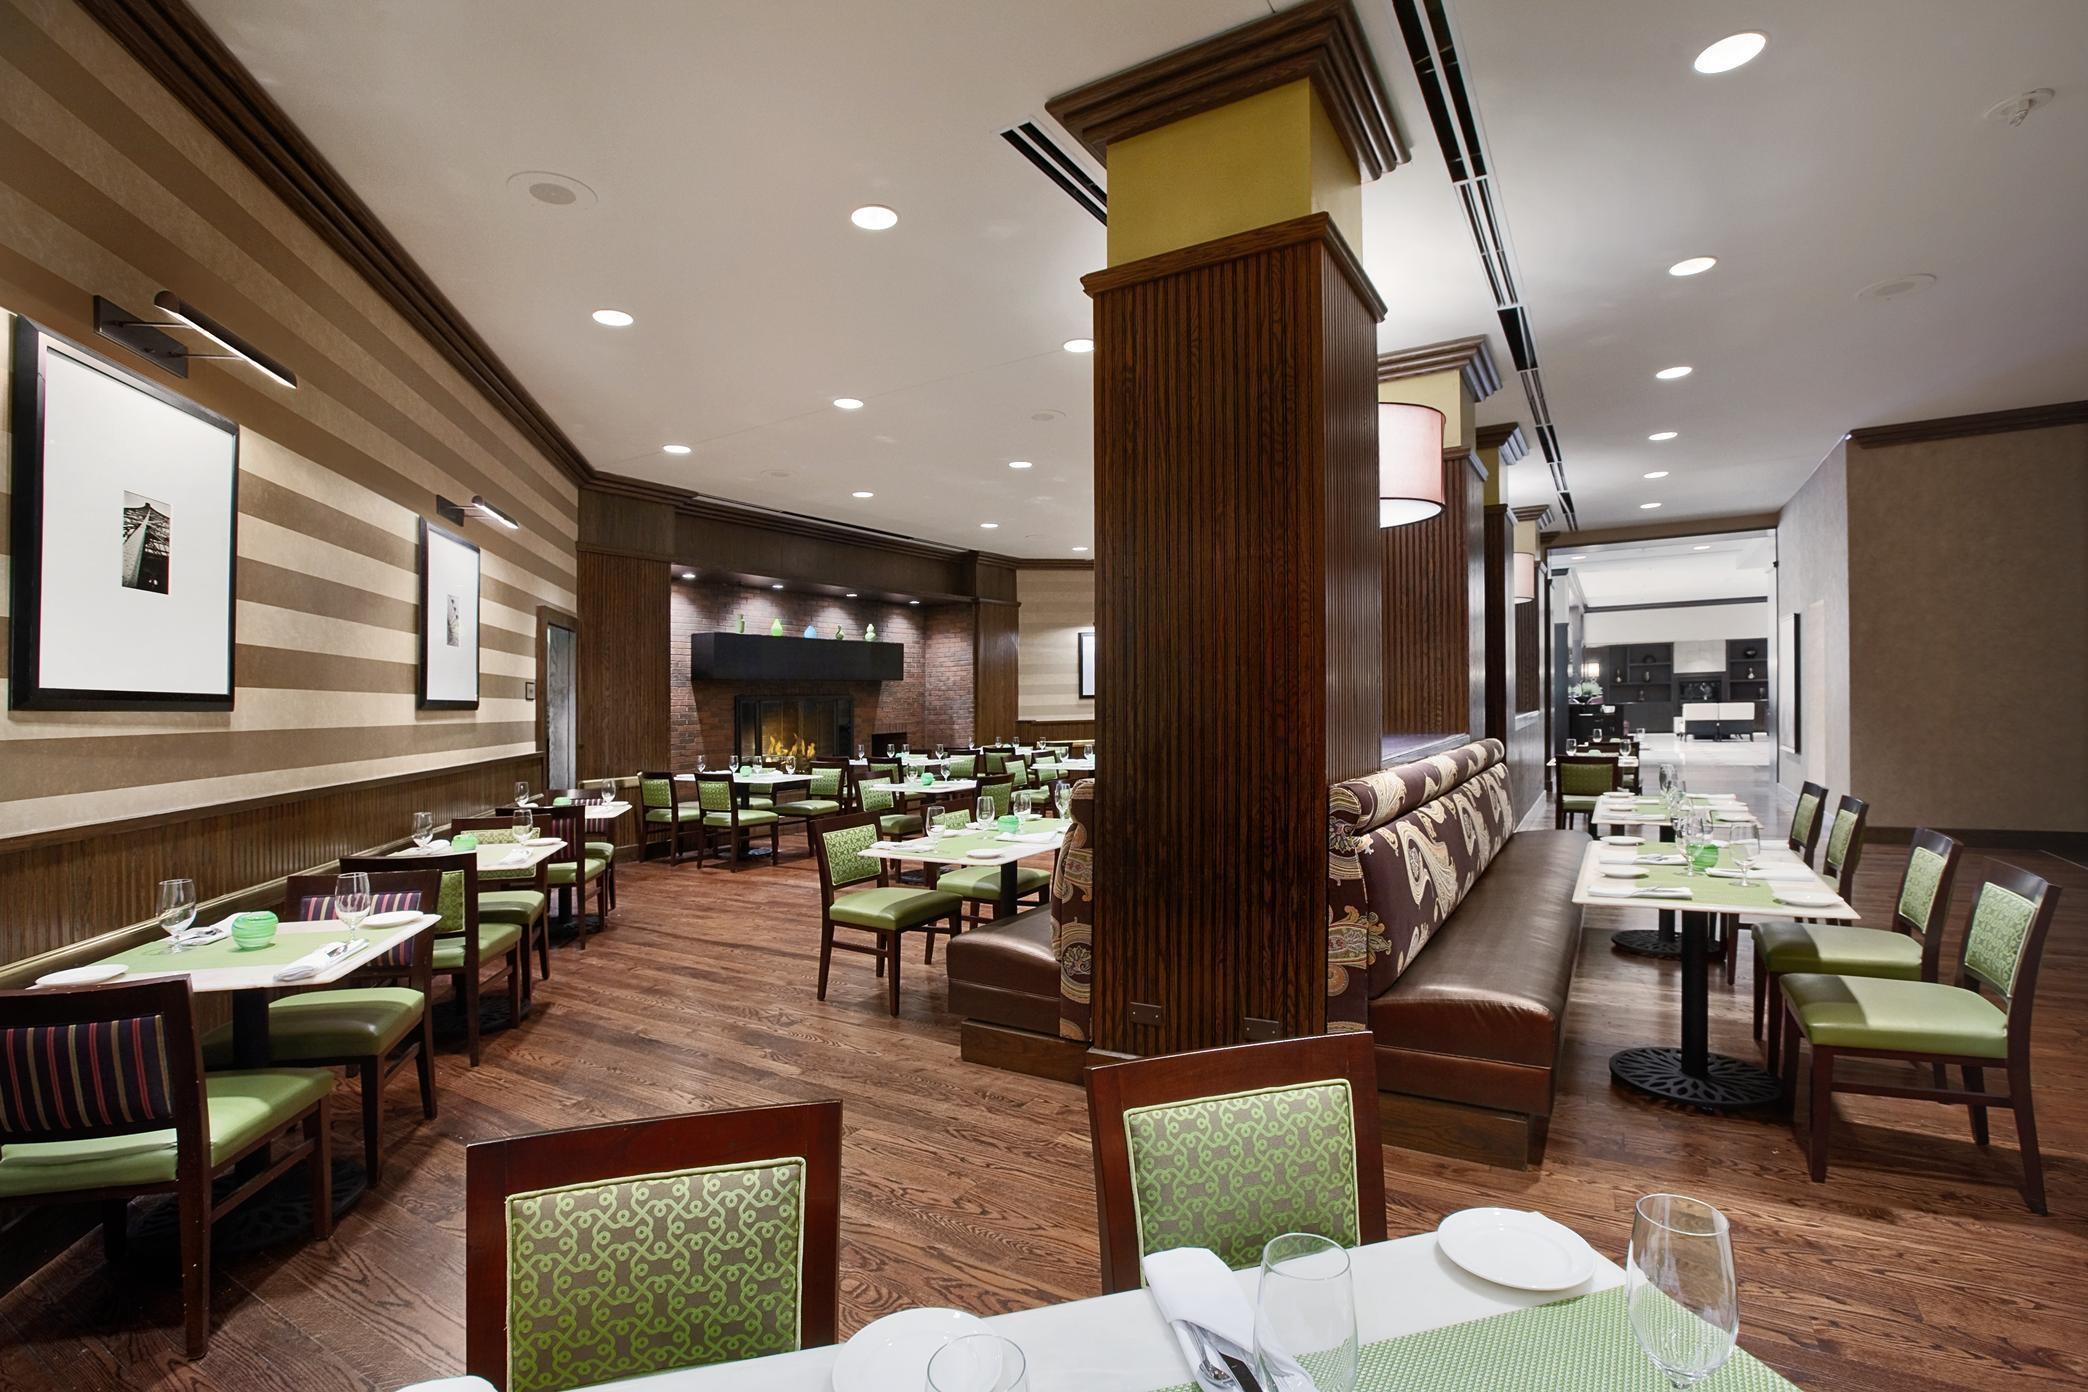 Hilton Rosemont/Chicago O'Hare image 11